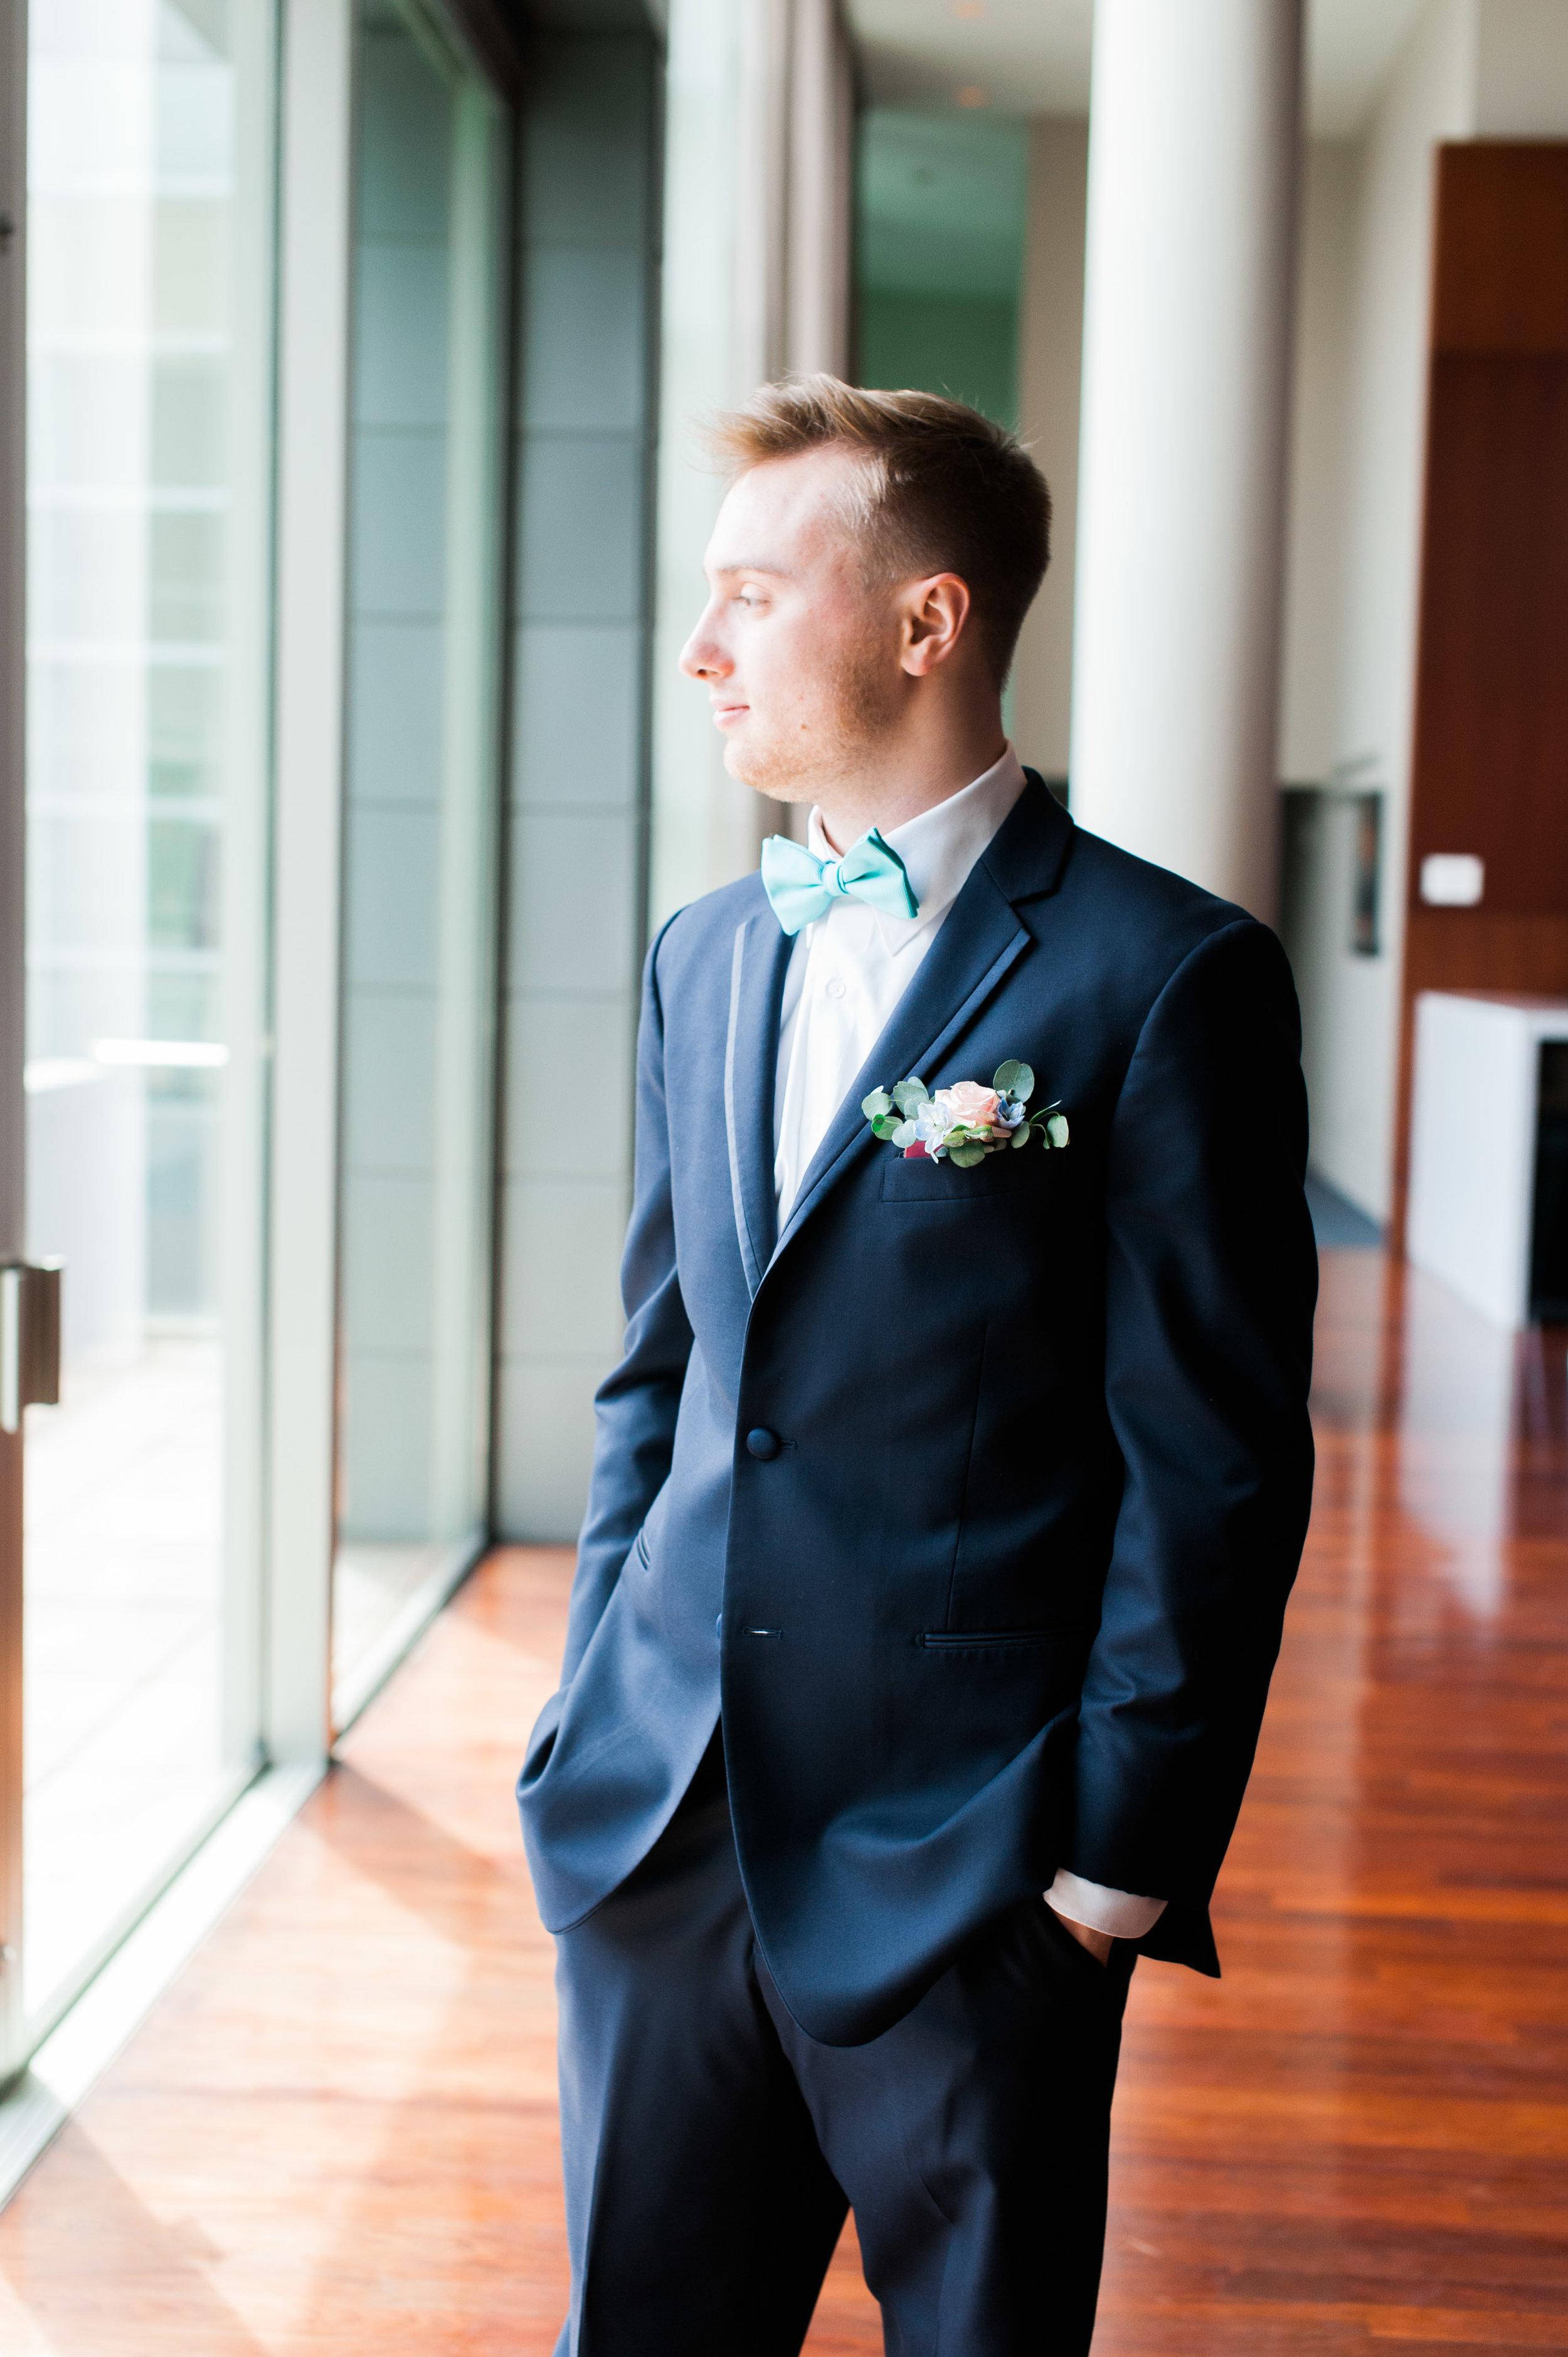 omaha-holland-arts-center-wedding-23.jpg